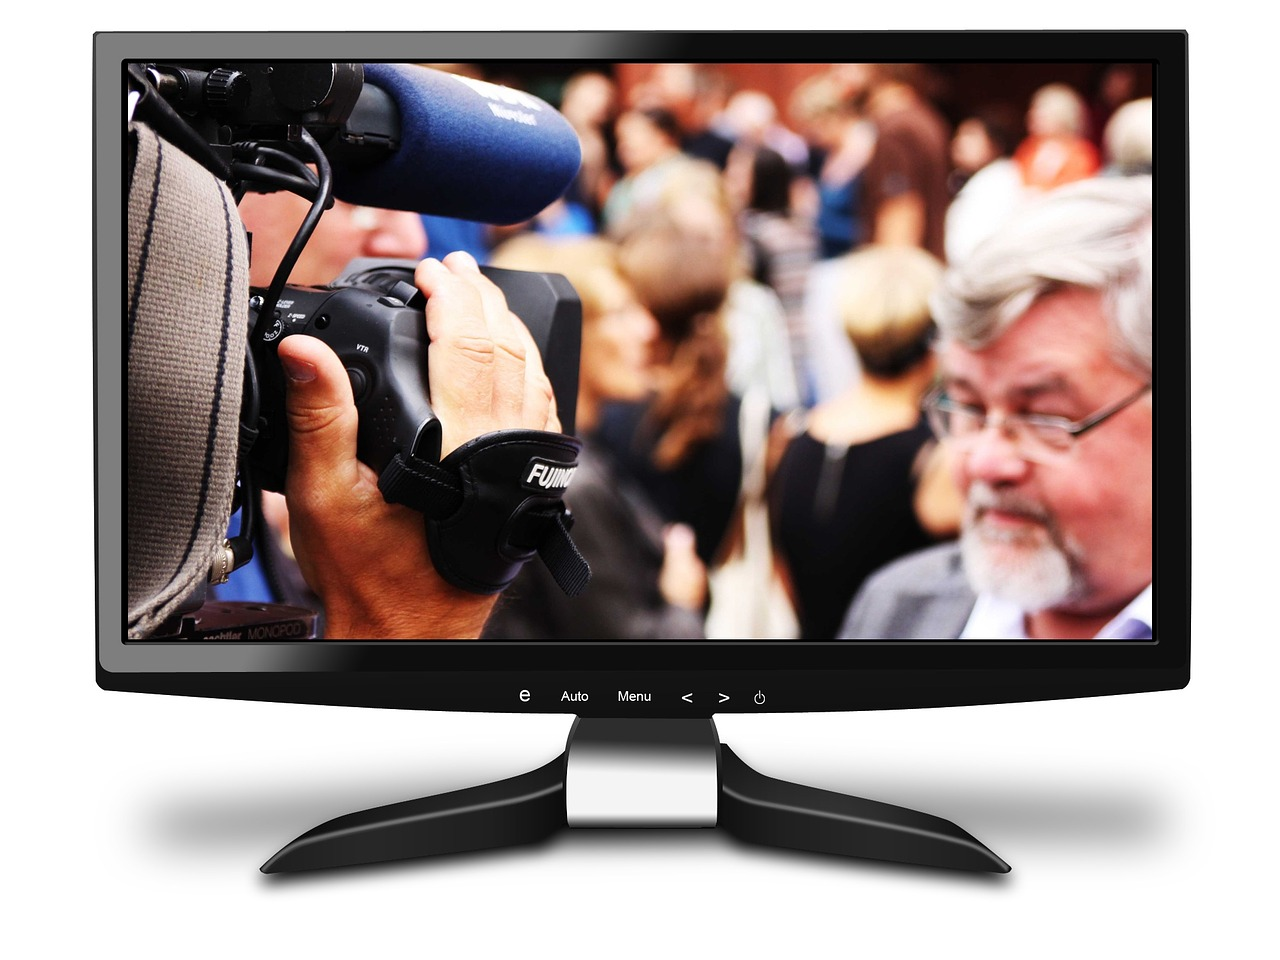 monitor-1276949_1280